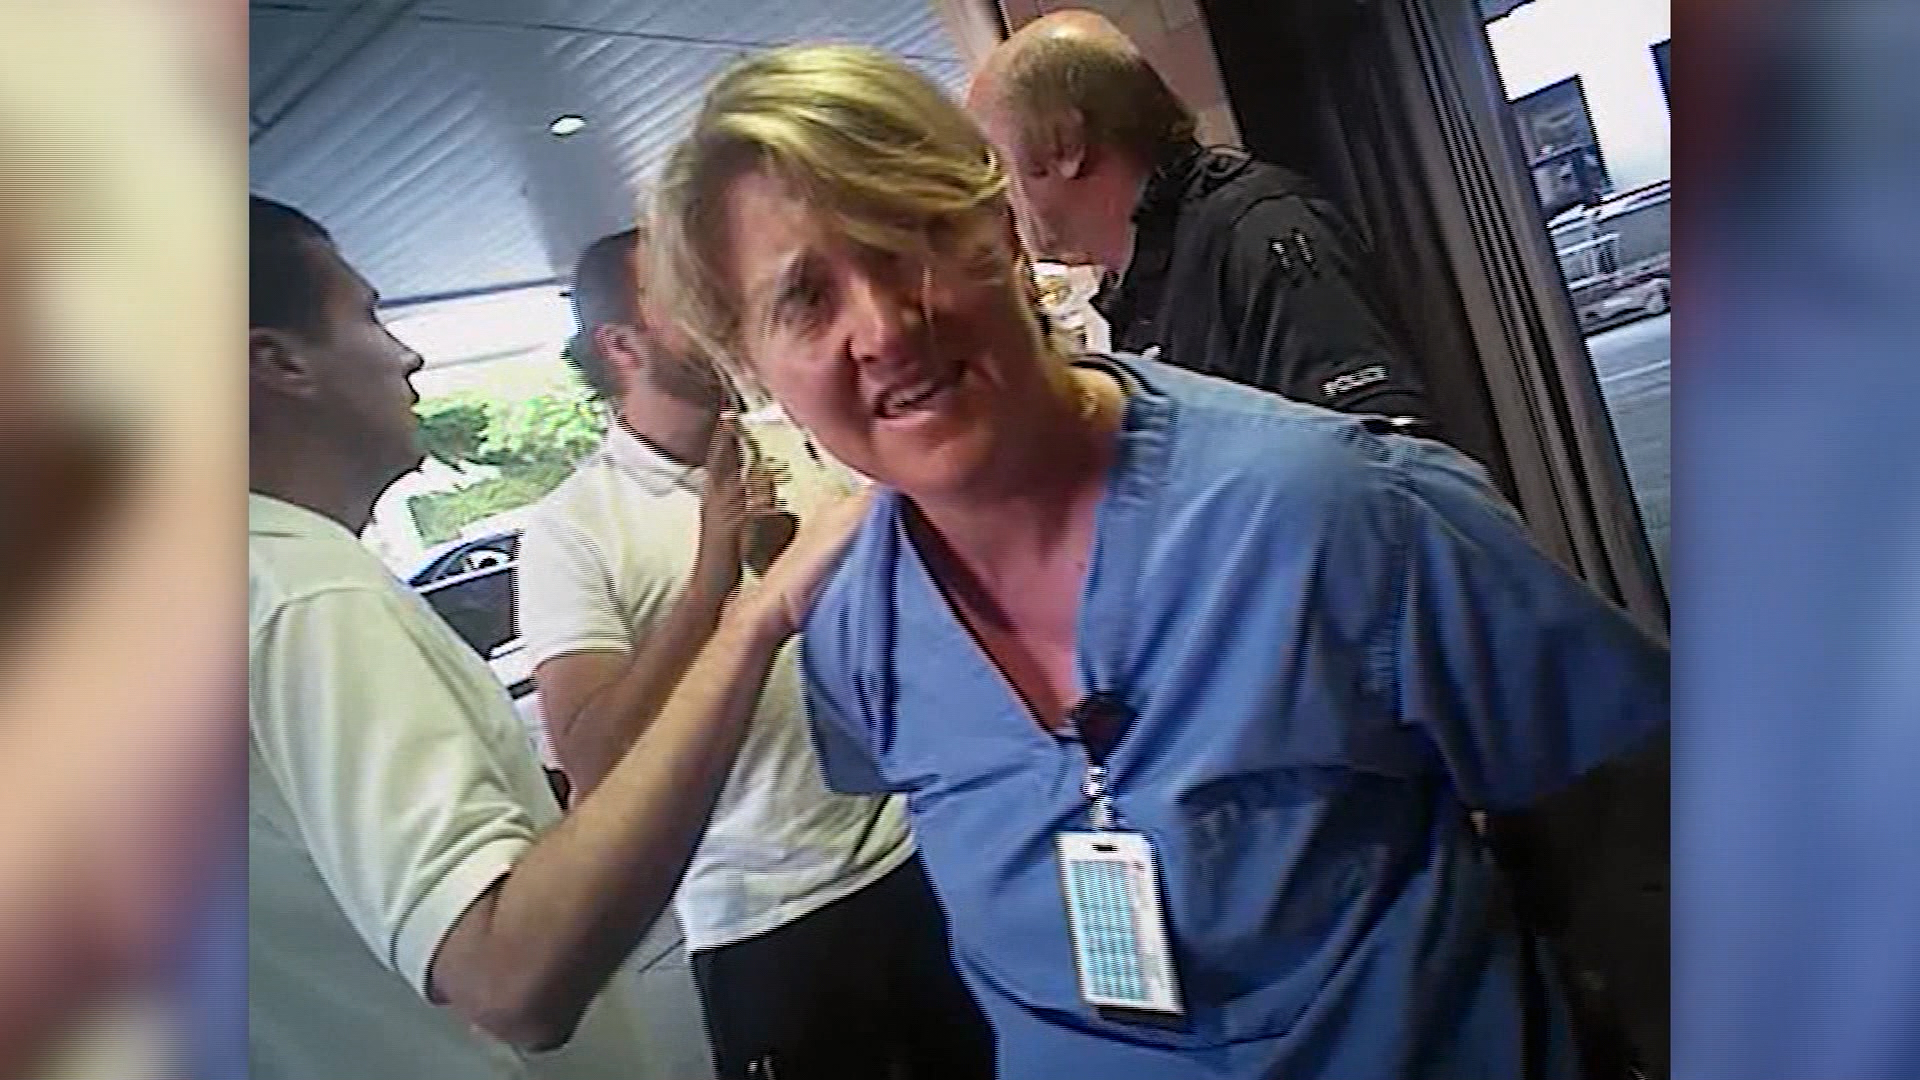 Body camera of Utah nurse arrest-159532.jpg49832792